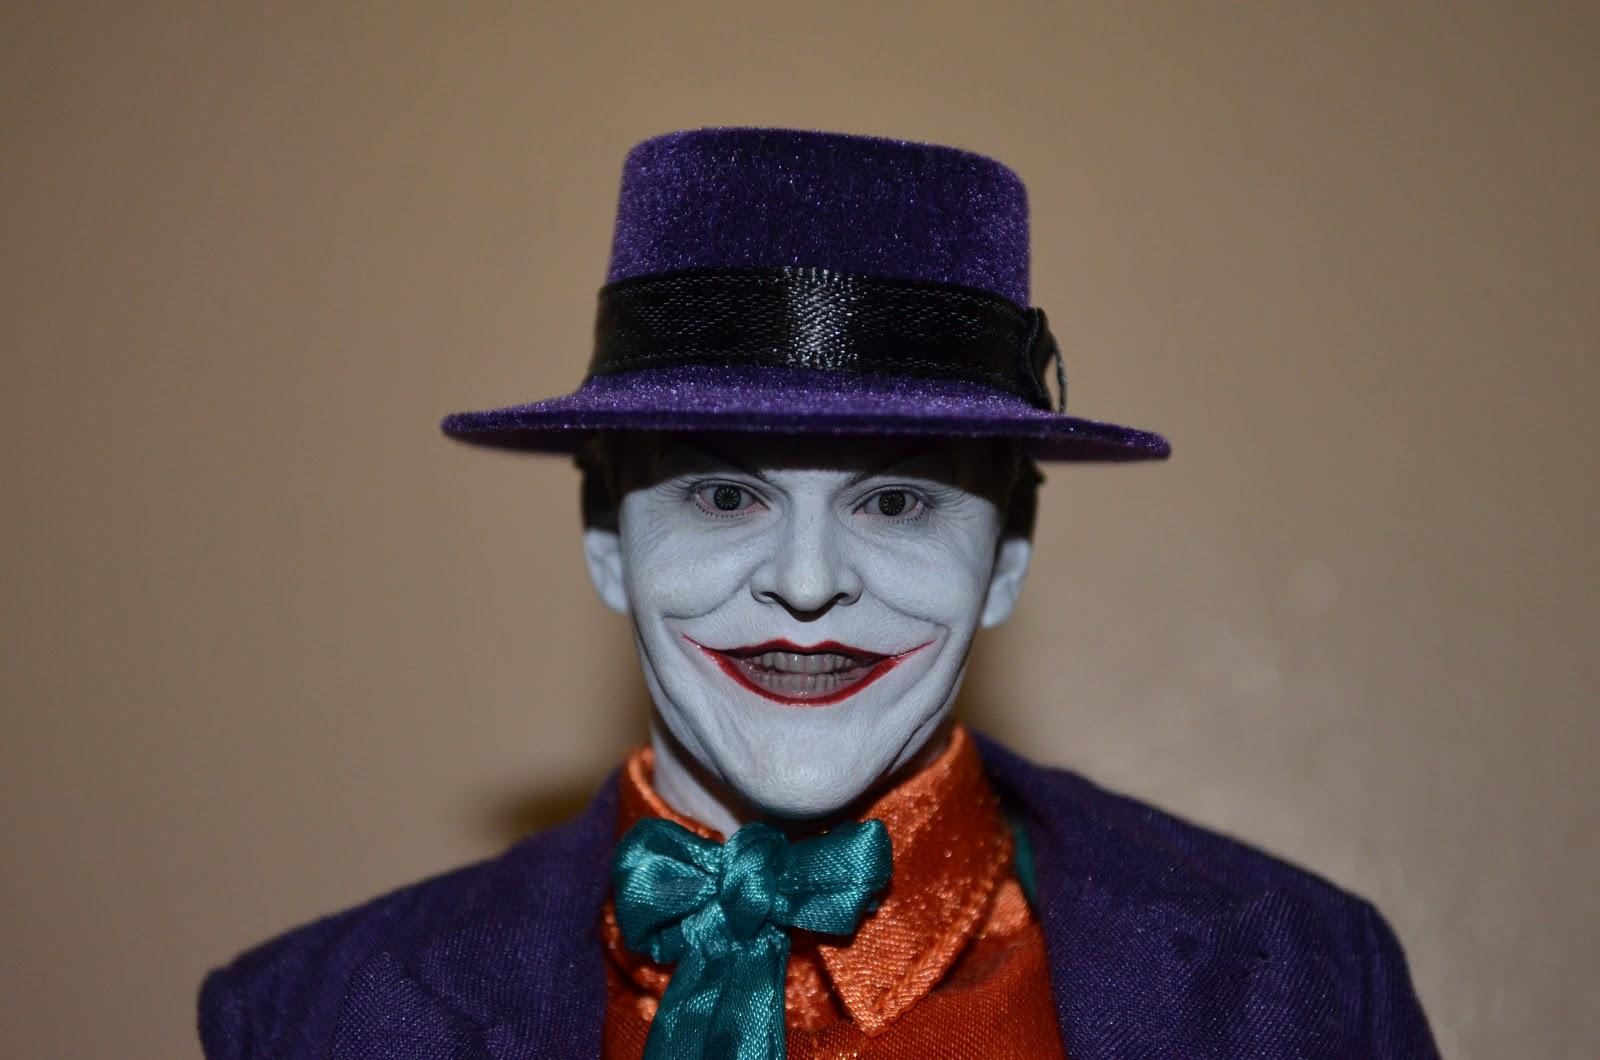 Jack Nicholson Joker Costume  sc 1 st  timehd & Jack Nicholson Joker Costume 93558   TIMEHD